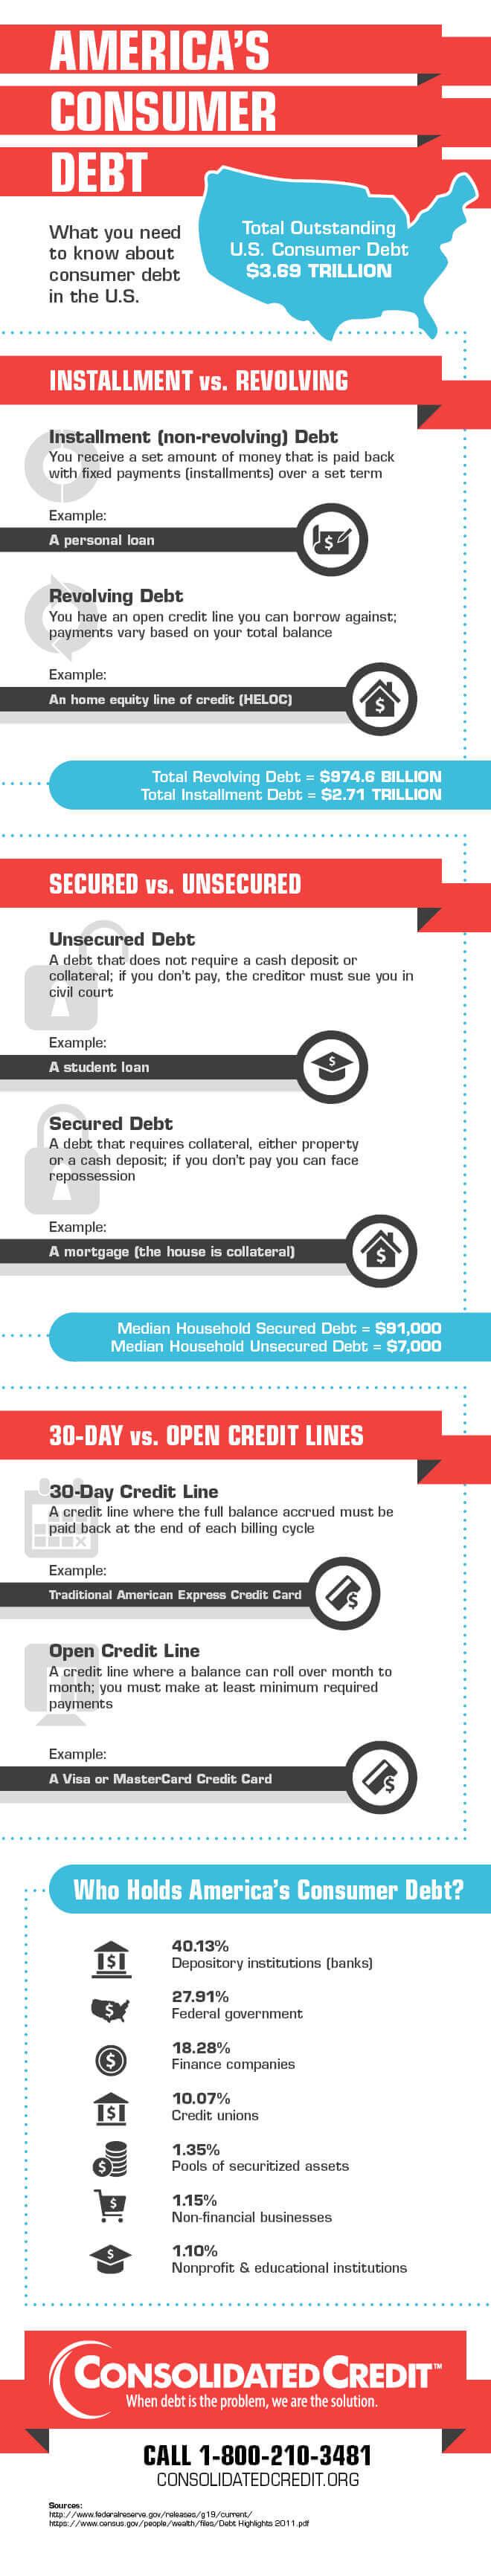 Consumer debt infographic